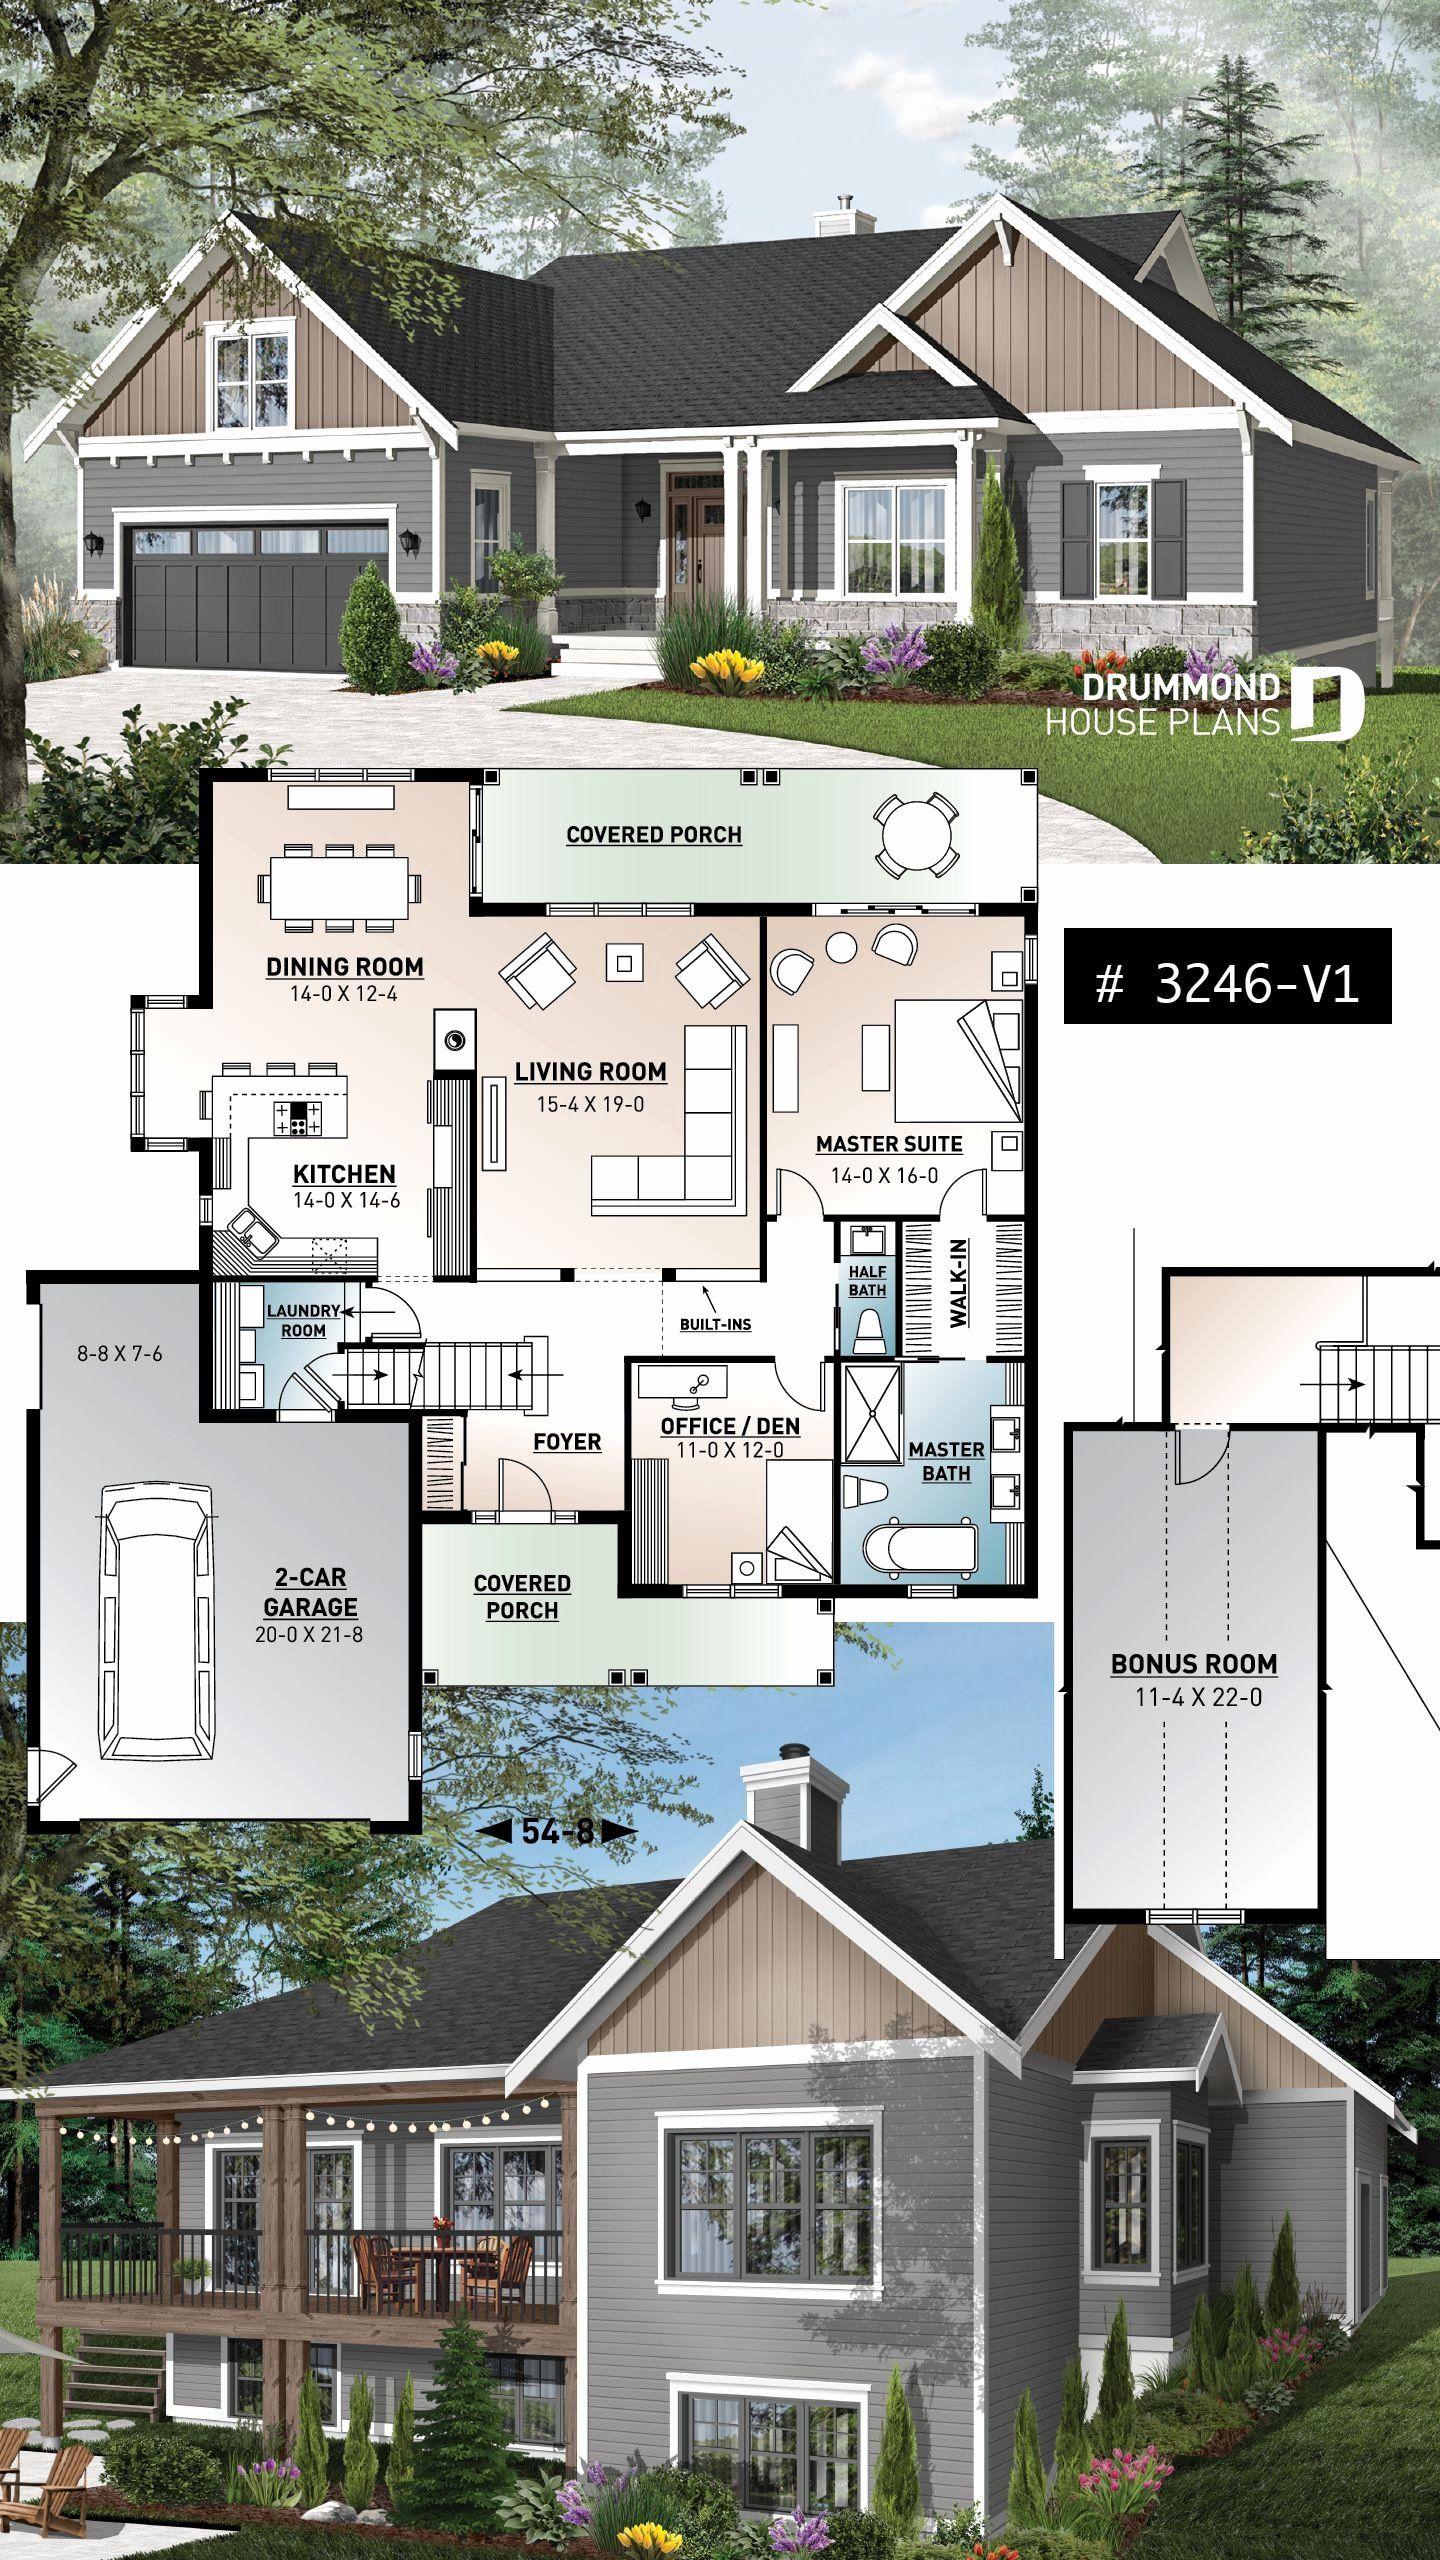 5 Bedroom Farmhouse House Plans Best Of Spectacular Modern Farmhouse Plan With Walkout Basemen In 2020 Craftsman House Plans Bungalow House Plans House Plans Farmhouse